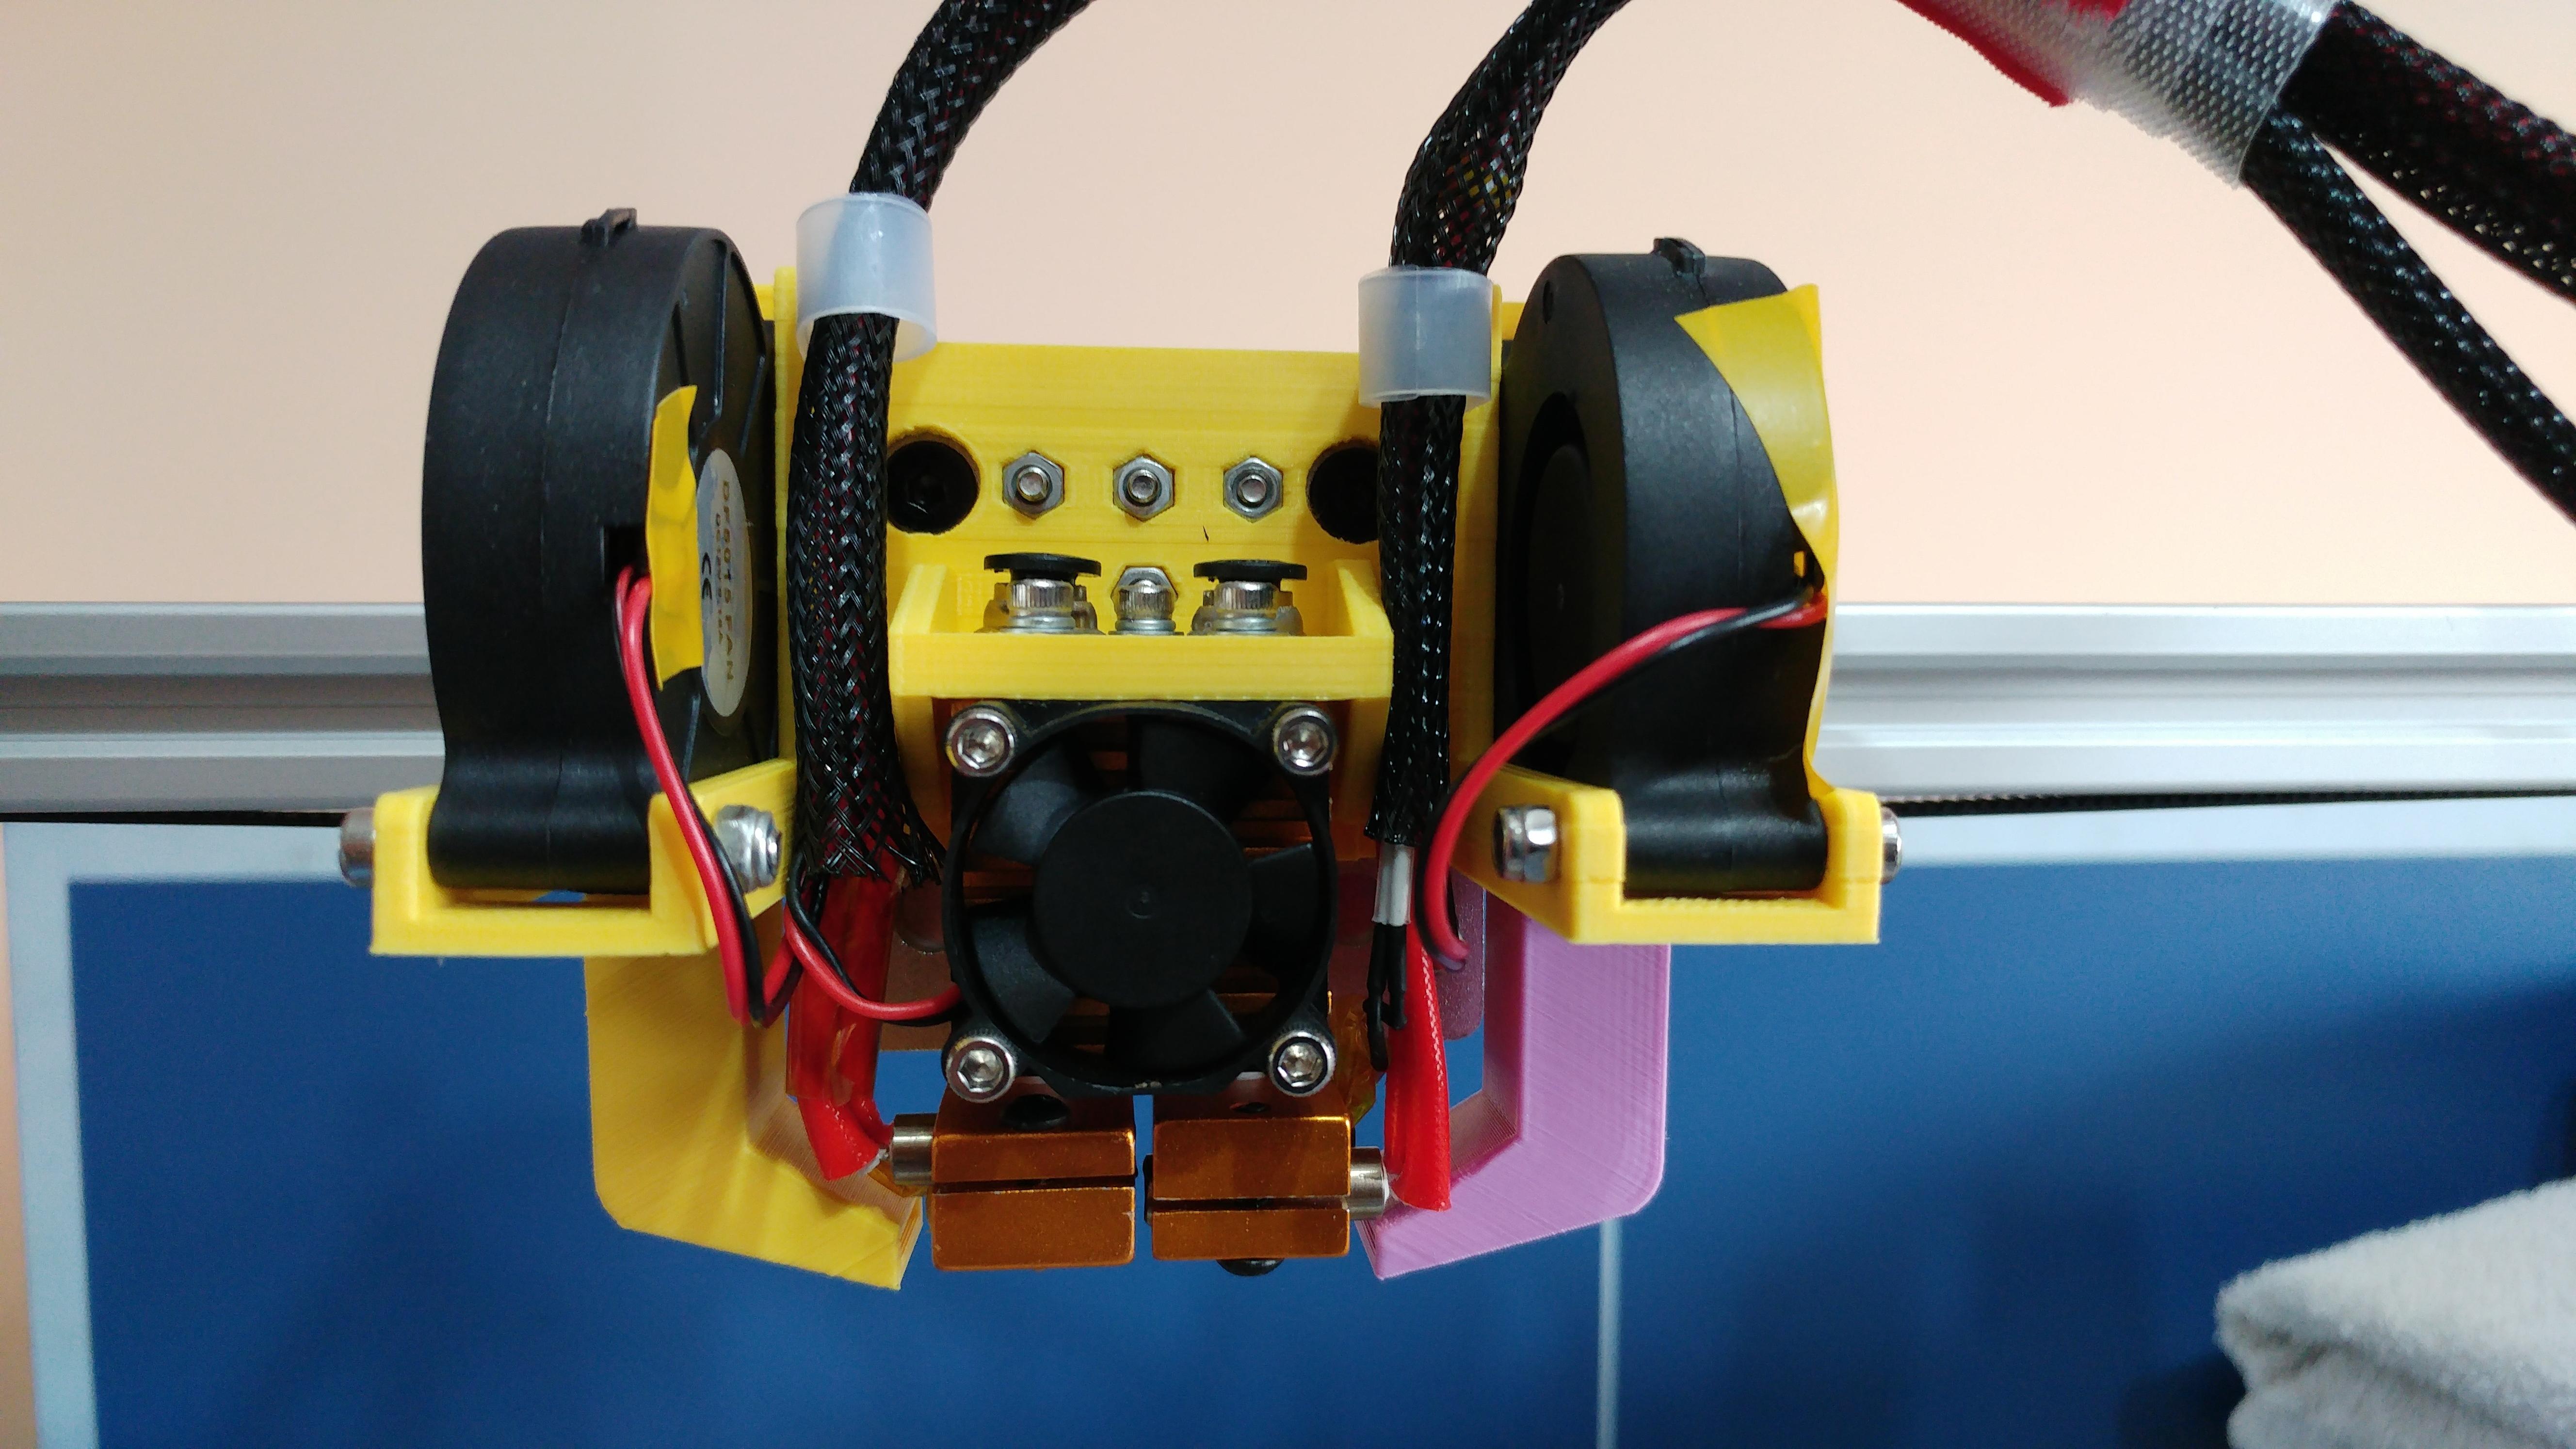 20191003_113550.jpg Télécharger fichier STL gratuit Soporte Hotend Chimera & Cyclops y 2 ventiladores de capa eje X Perfil aluminio 2020 // Soporte BMG + Hotend V6 • Objet pour impression 3D, celtarra12